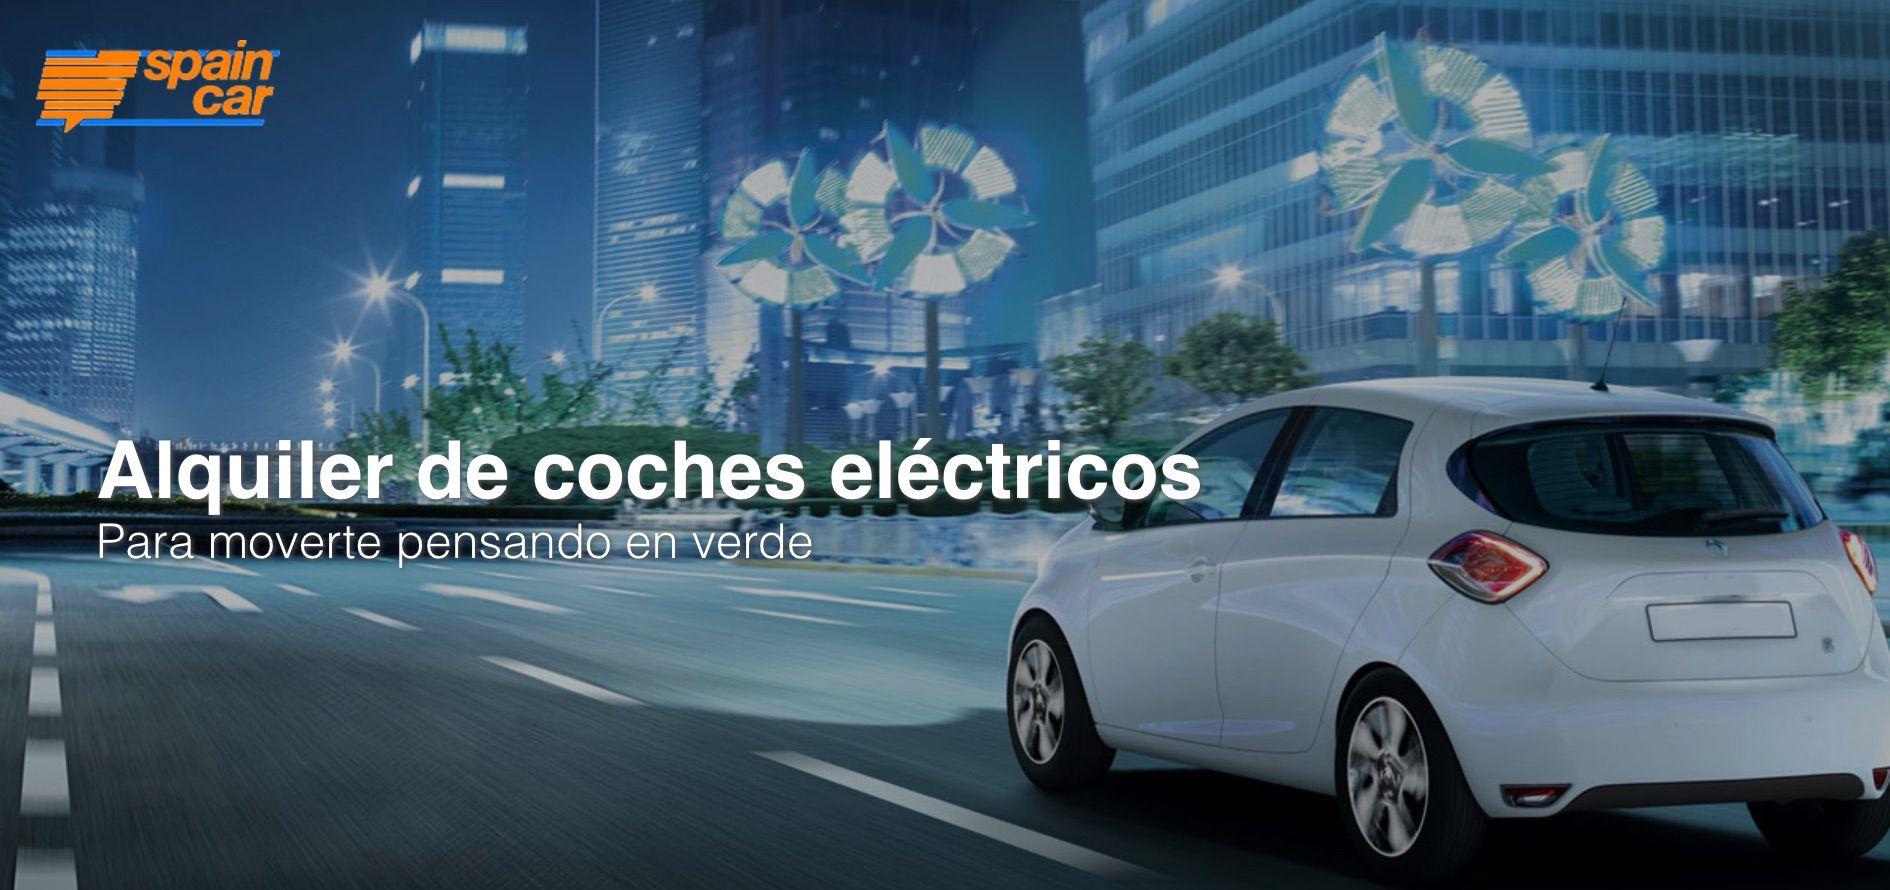 Fotografia SPAIN CAR Alquiler de coches eléctricos